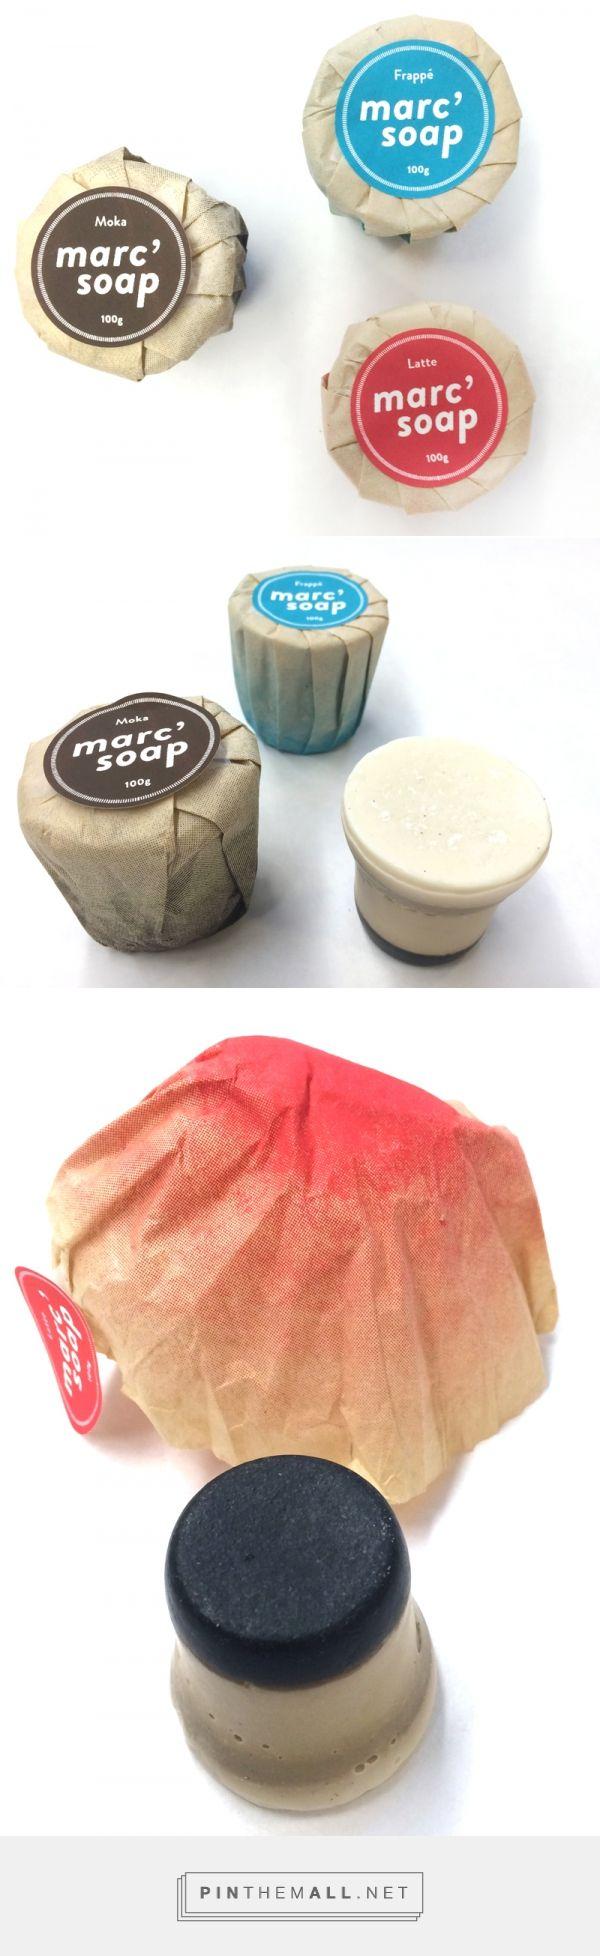 Marc's soap   Audrey-Claude Roy #packaging